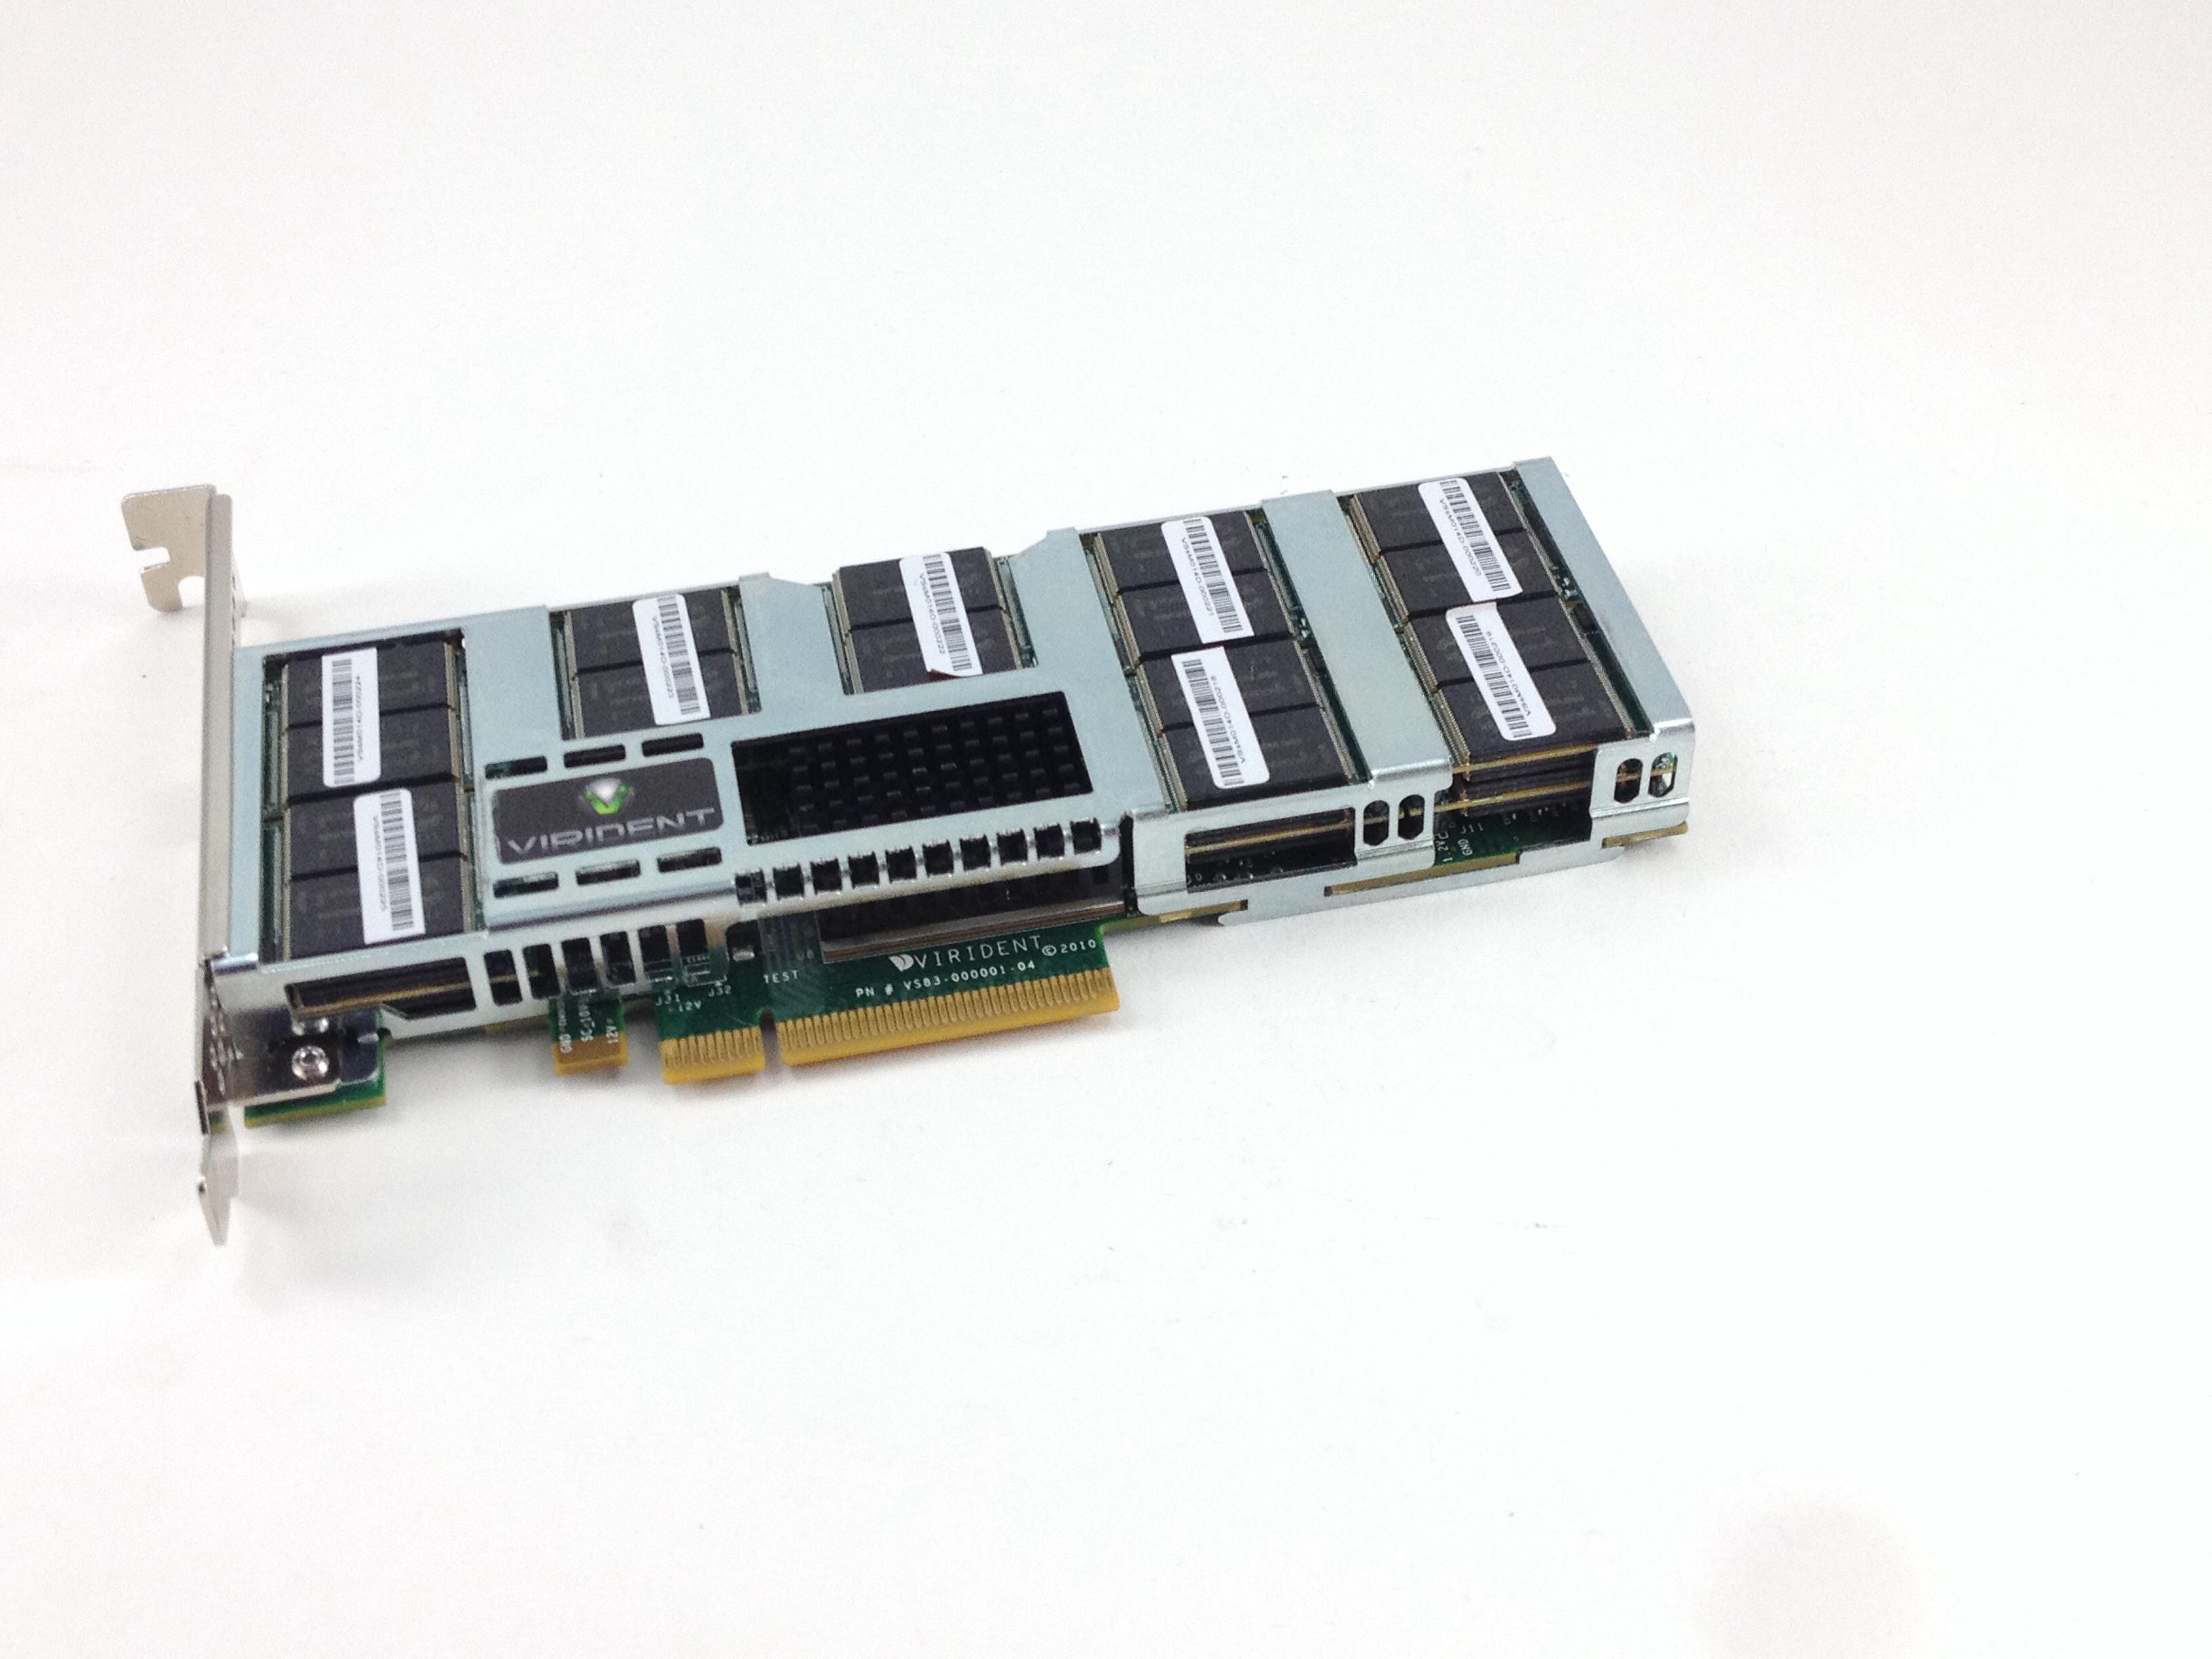 Virident-Flashmax-M1400 1.4TB MLC PCI-E Solid State Drive SSD (VS83-000001-04)